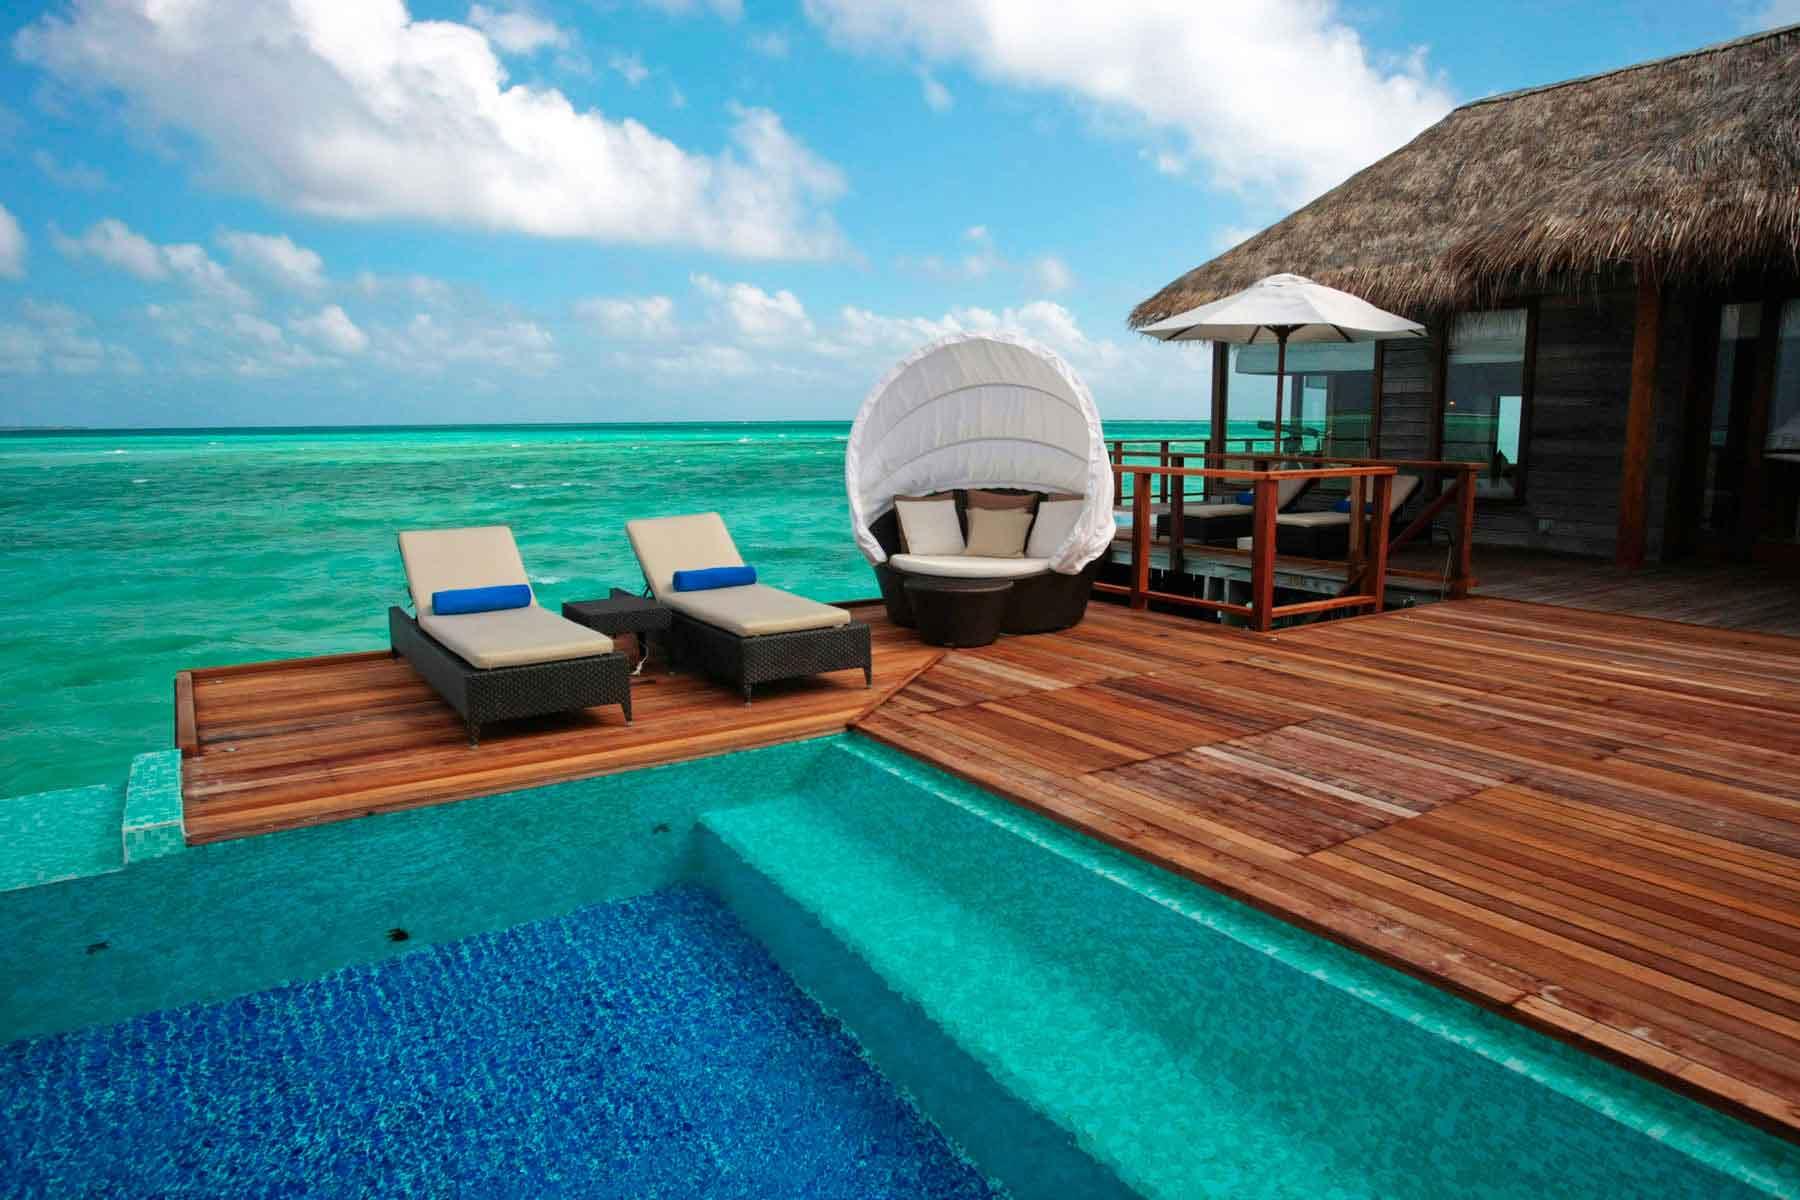 Hotel-Conrad-Rangali,-Maldives-outside-sunbeds